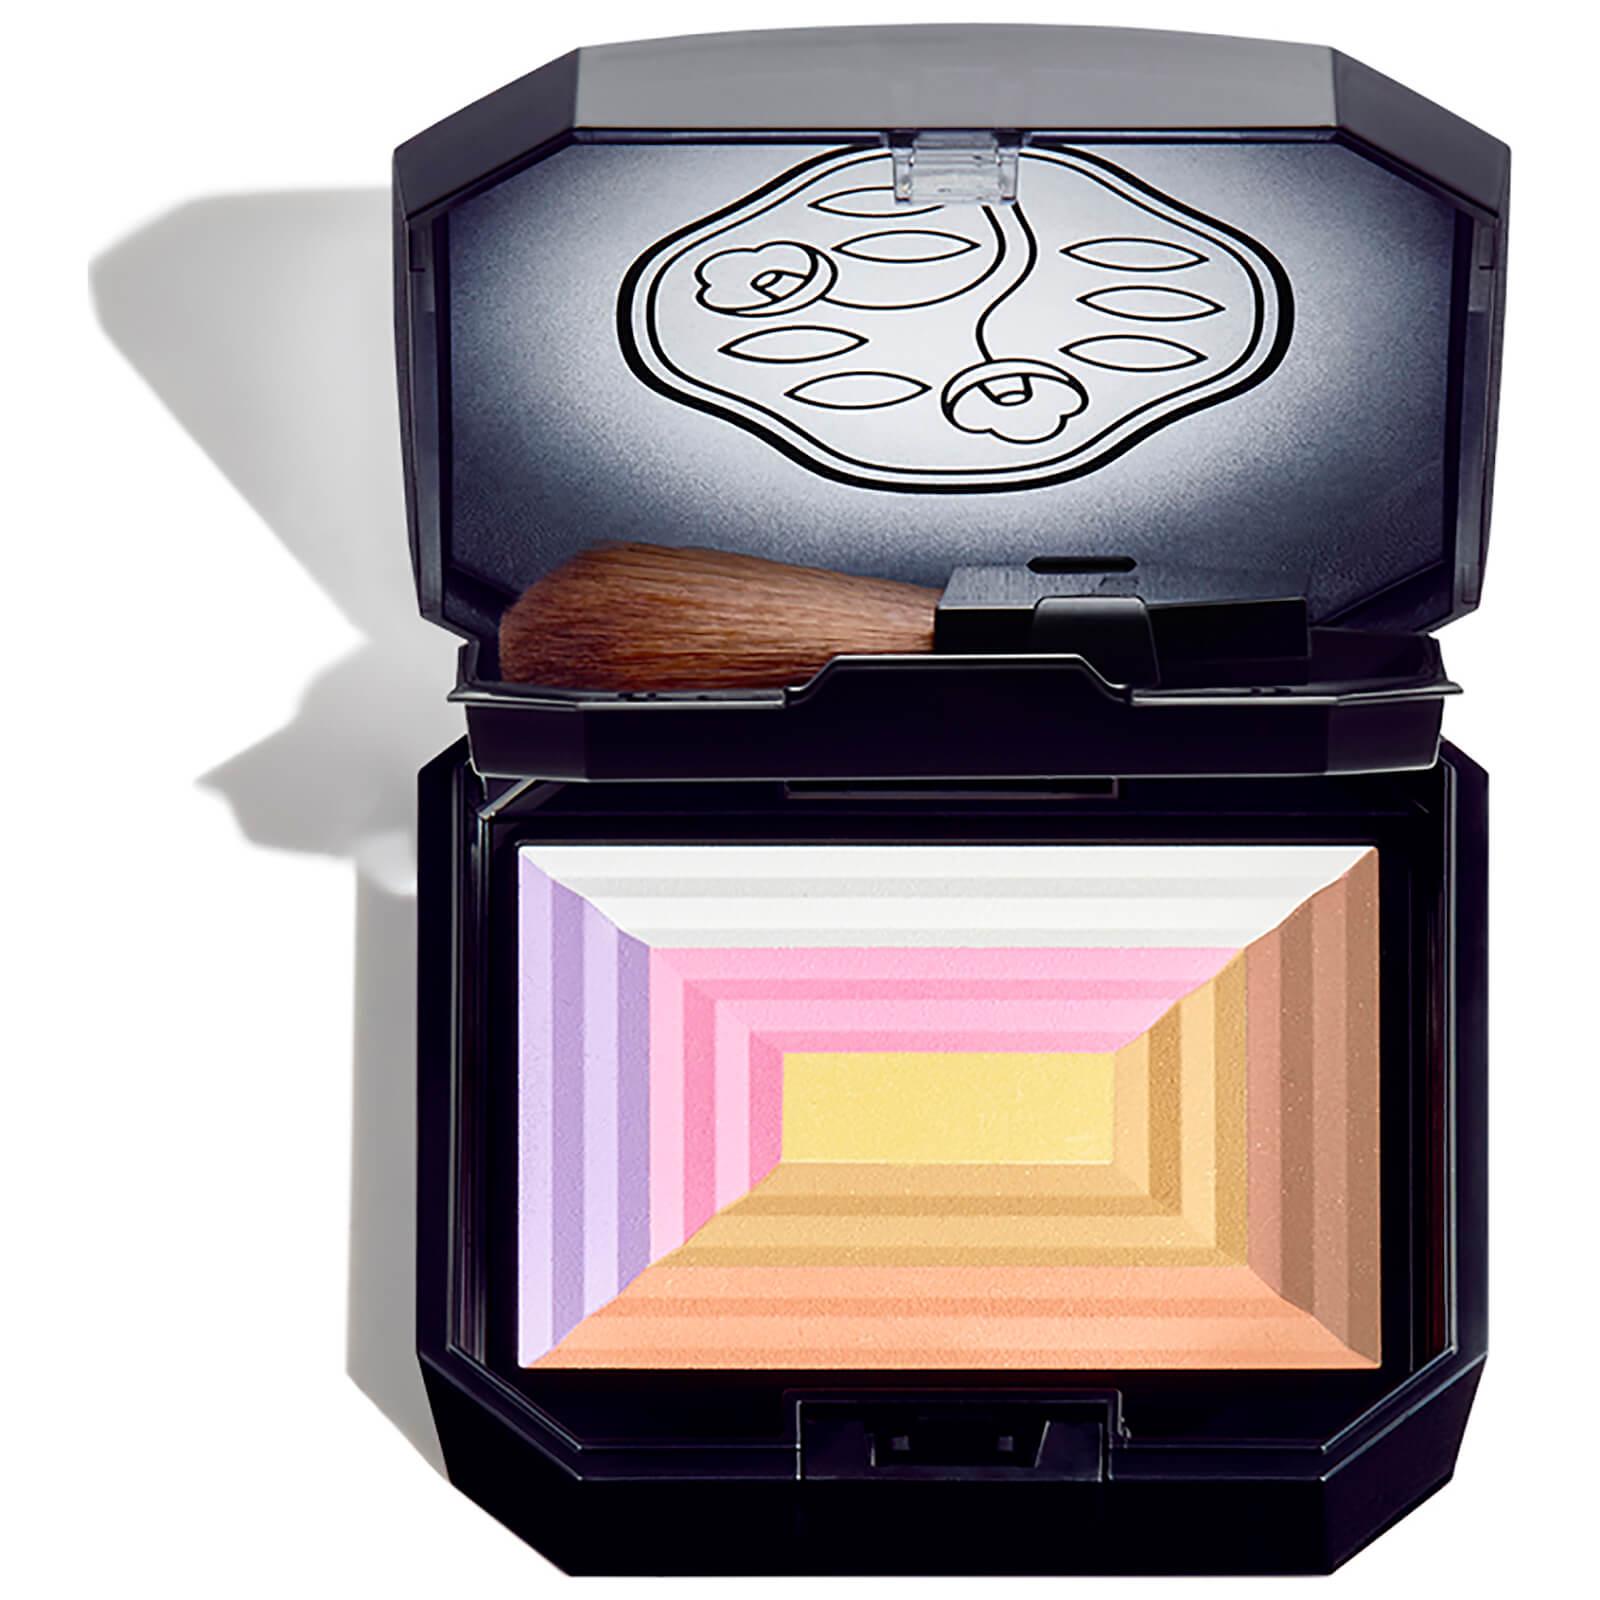 Shiseido 7 Lights illuminante in polvere 10 g